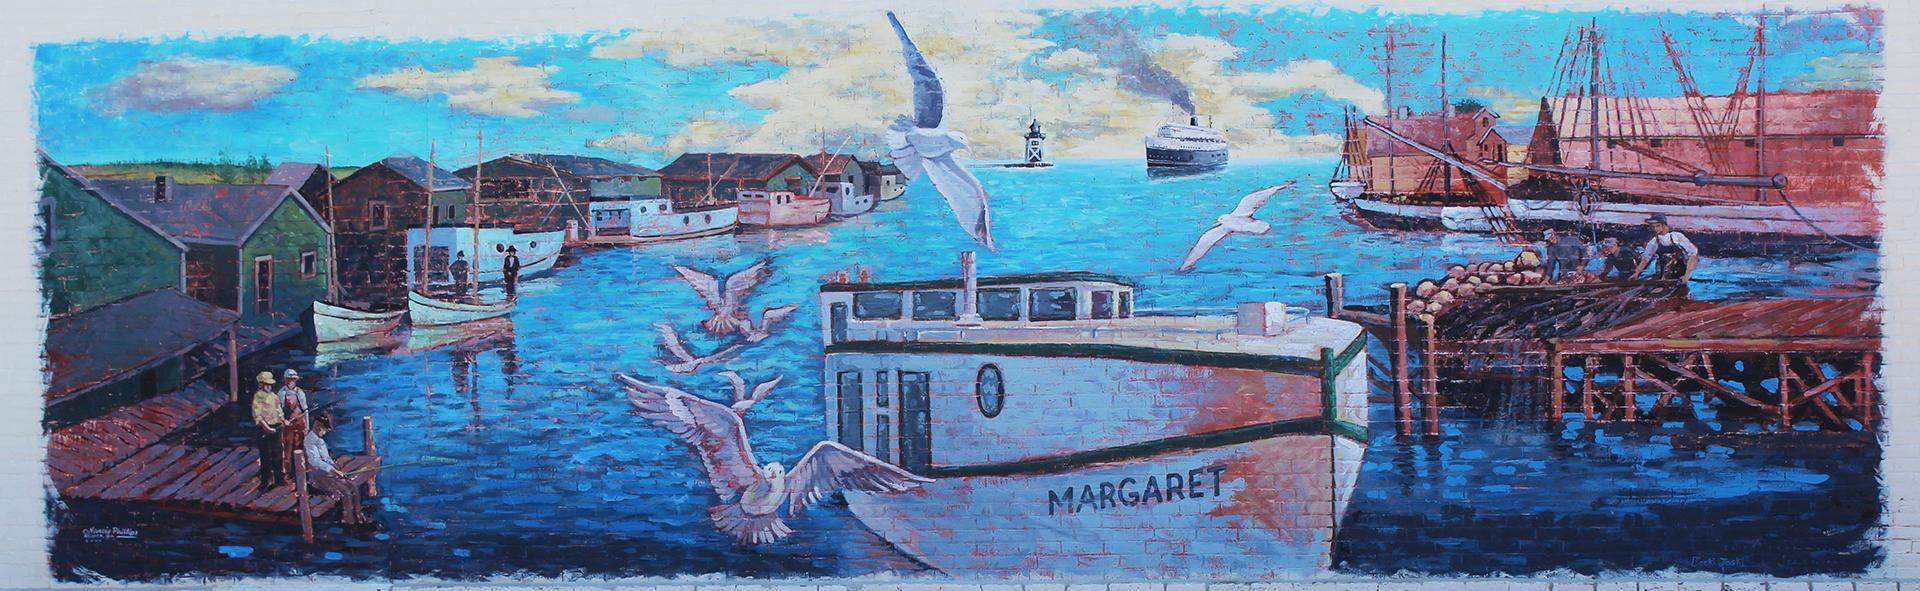 Margaret Mural